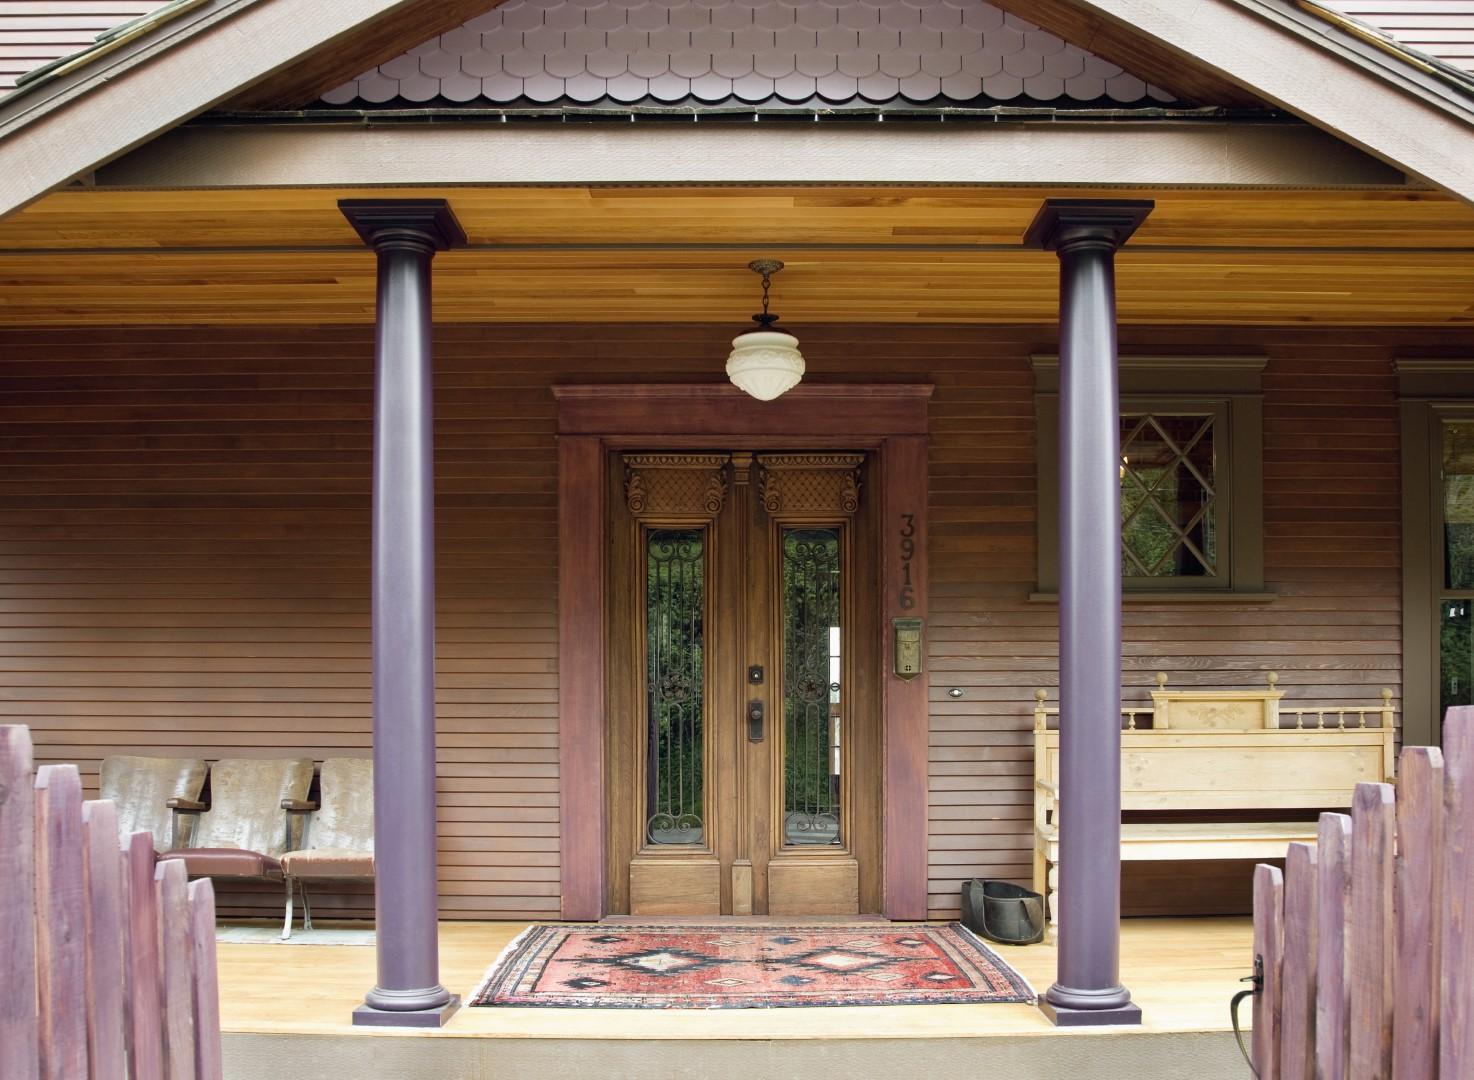 Wood Siding on a house